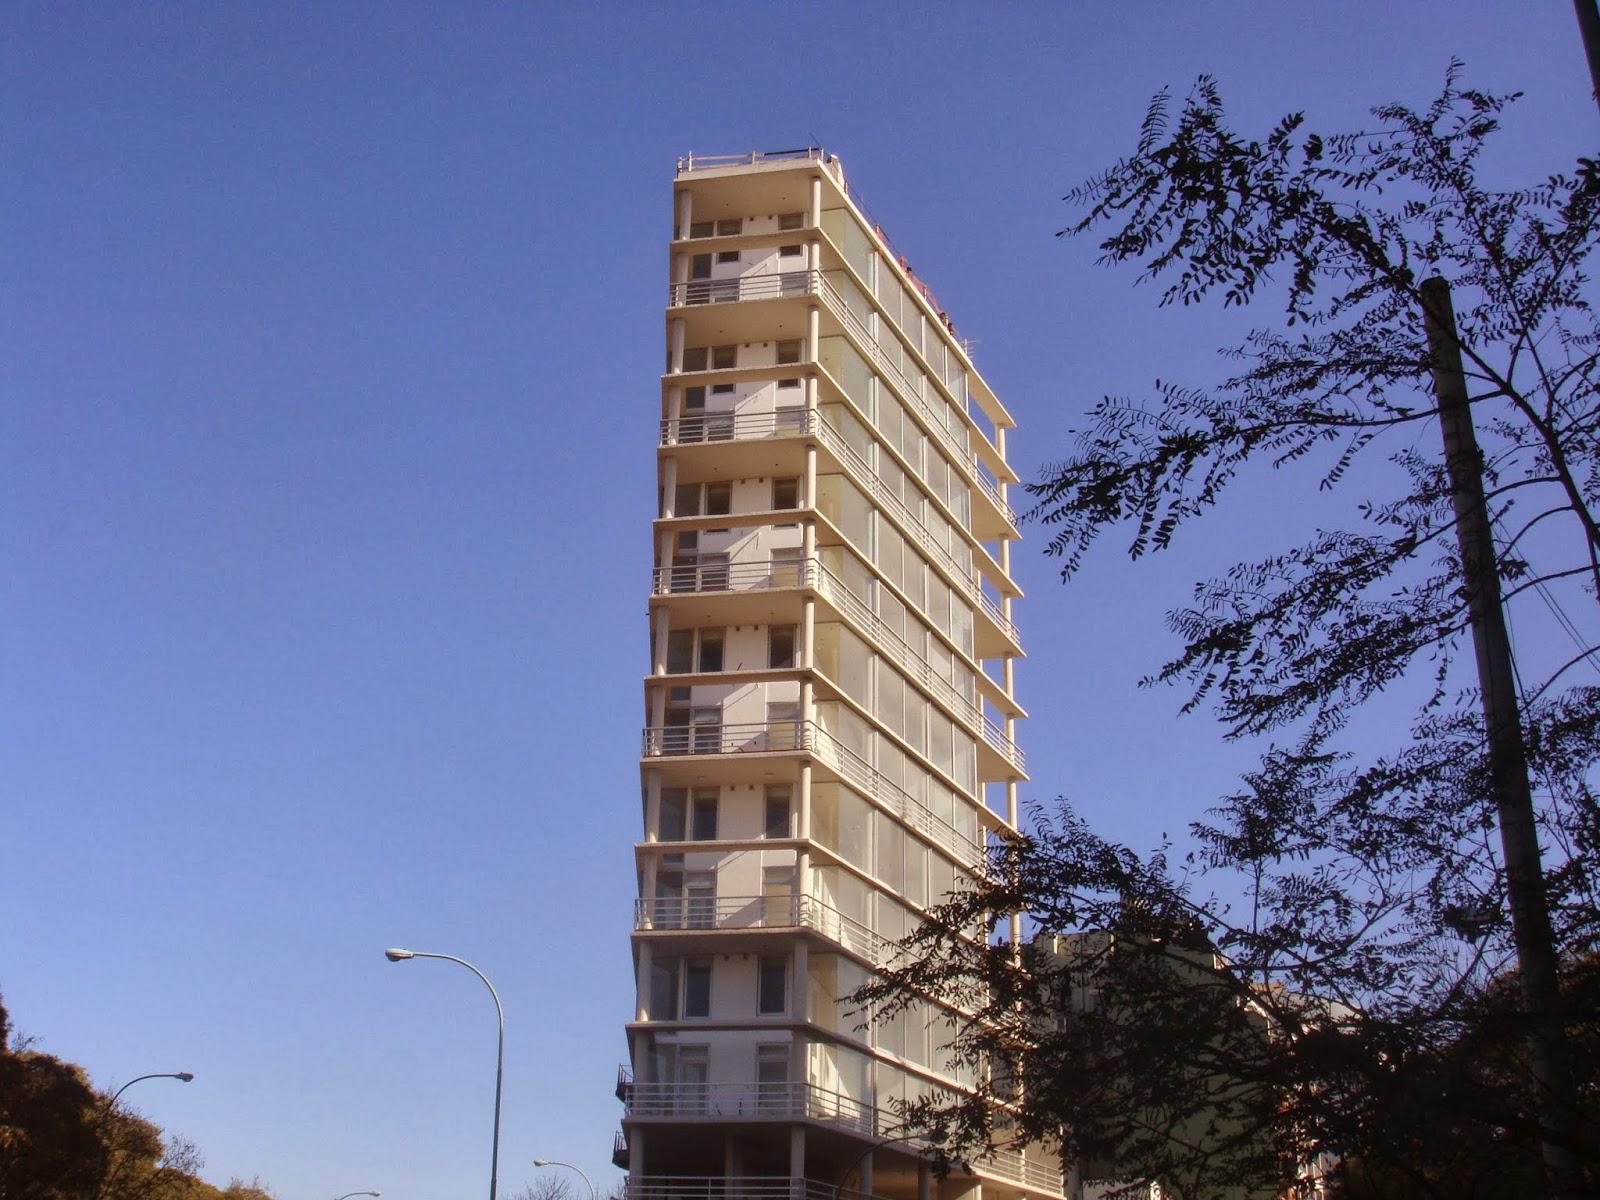 Mala informaci n es un accidente mortal evitable busco for Busco arquitecto